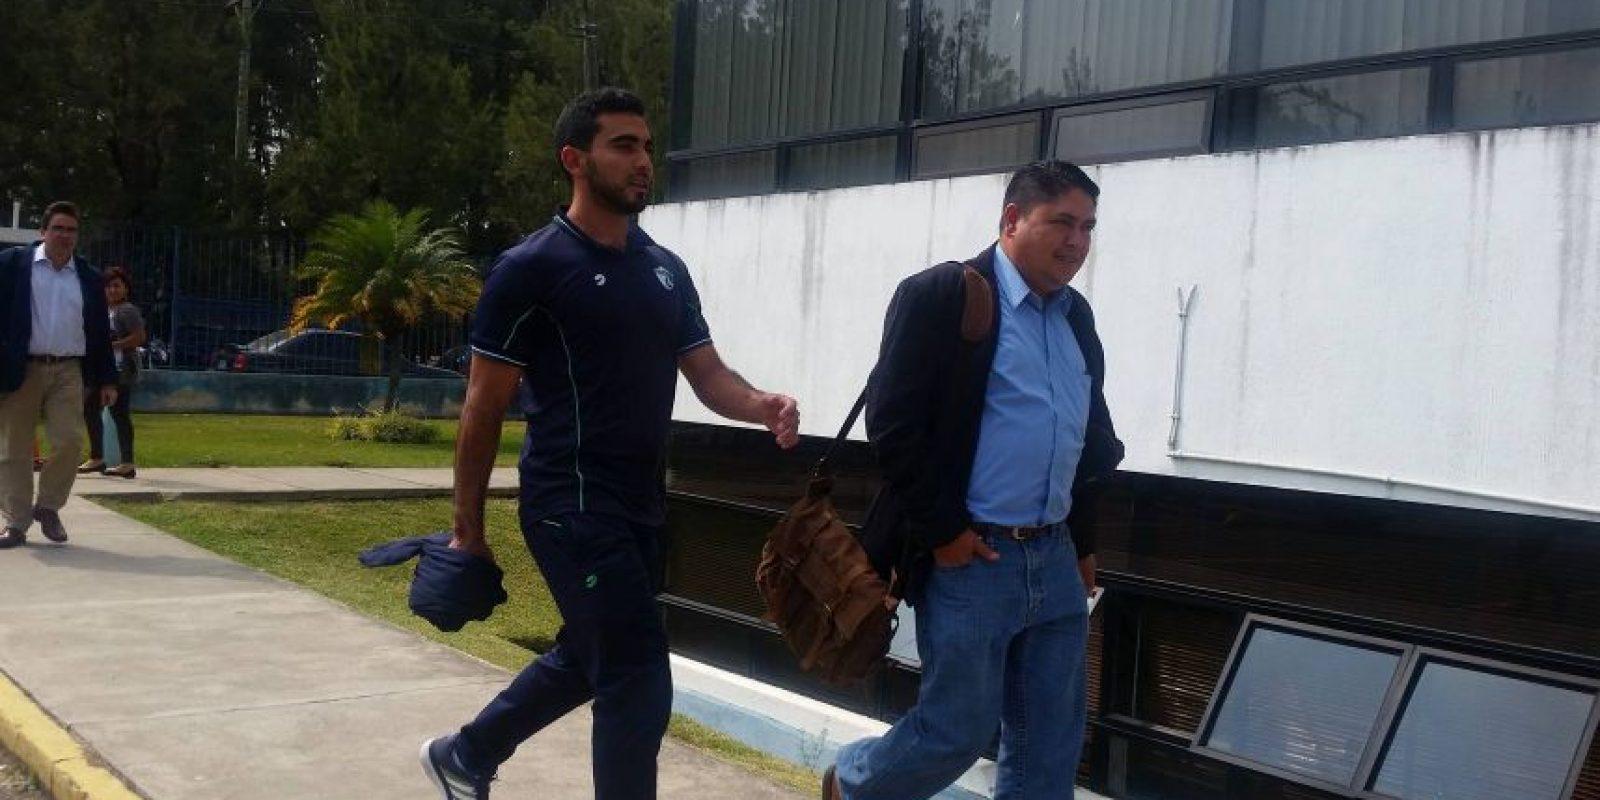 Víctor Ayala tras salir de la audiencia. Foto:Reina Damián